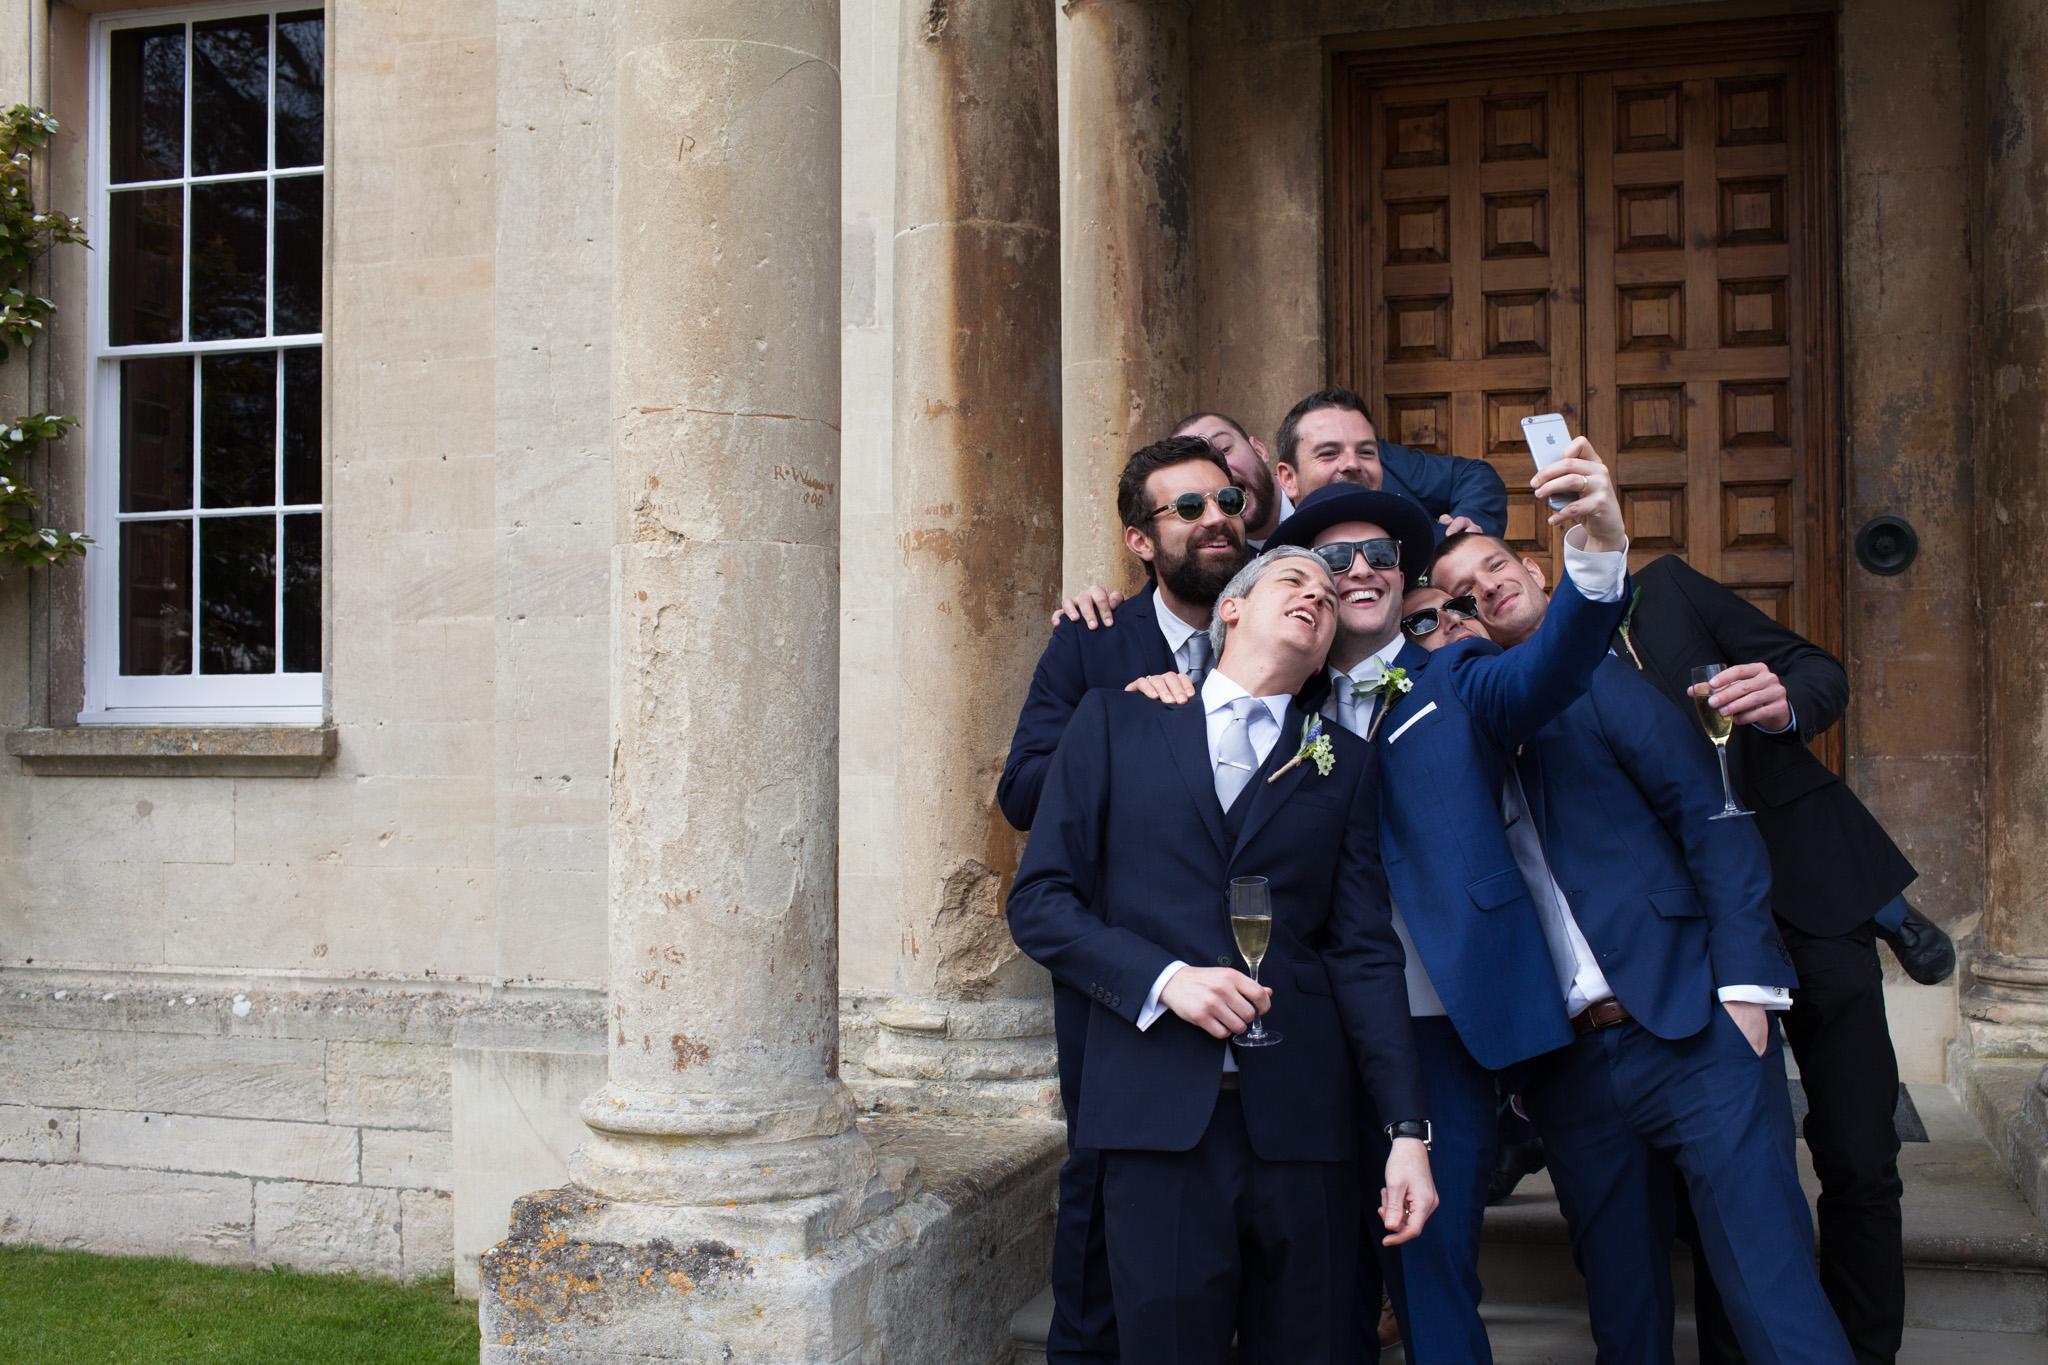 Mark_Barnes_Gloucester_Wedding_Photographer_Elmore_Court_Wedding_Photography_Mike+Kelly-71.jpg